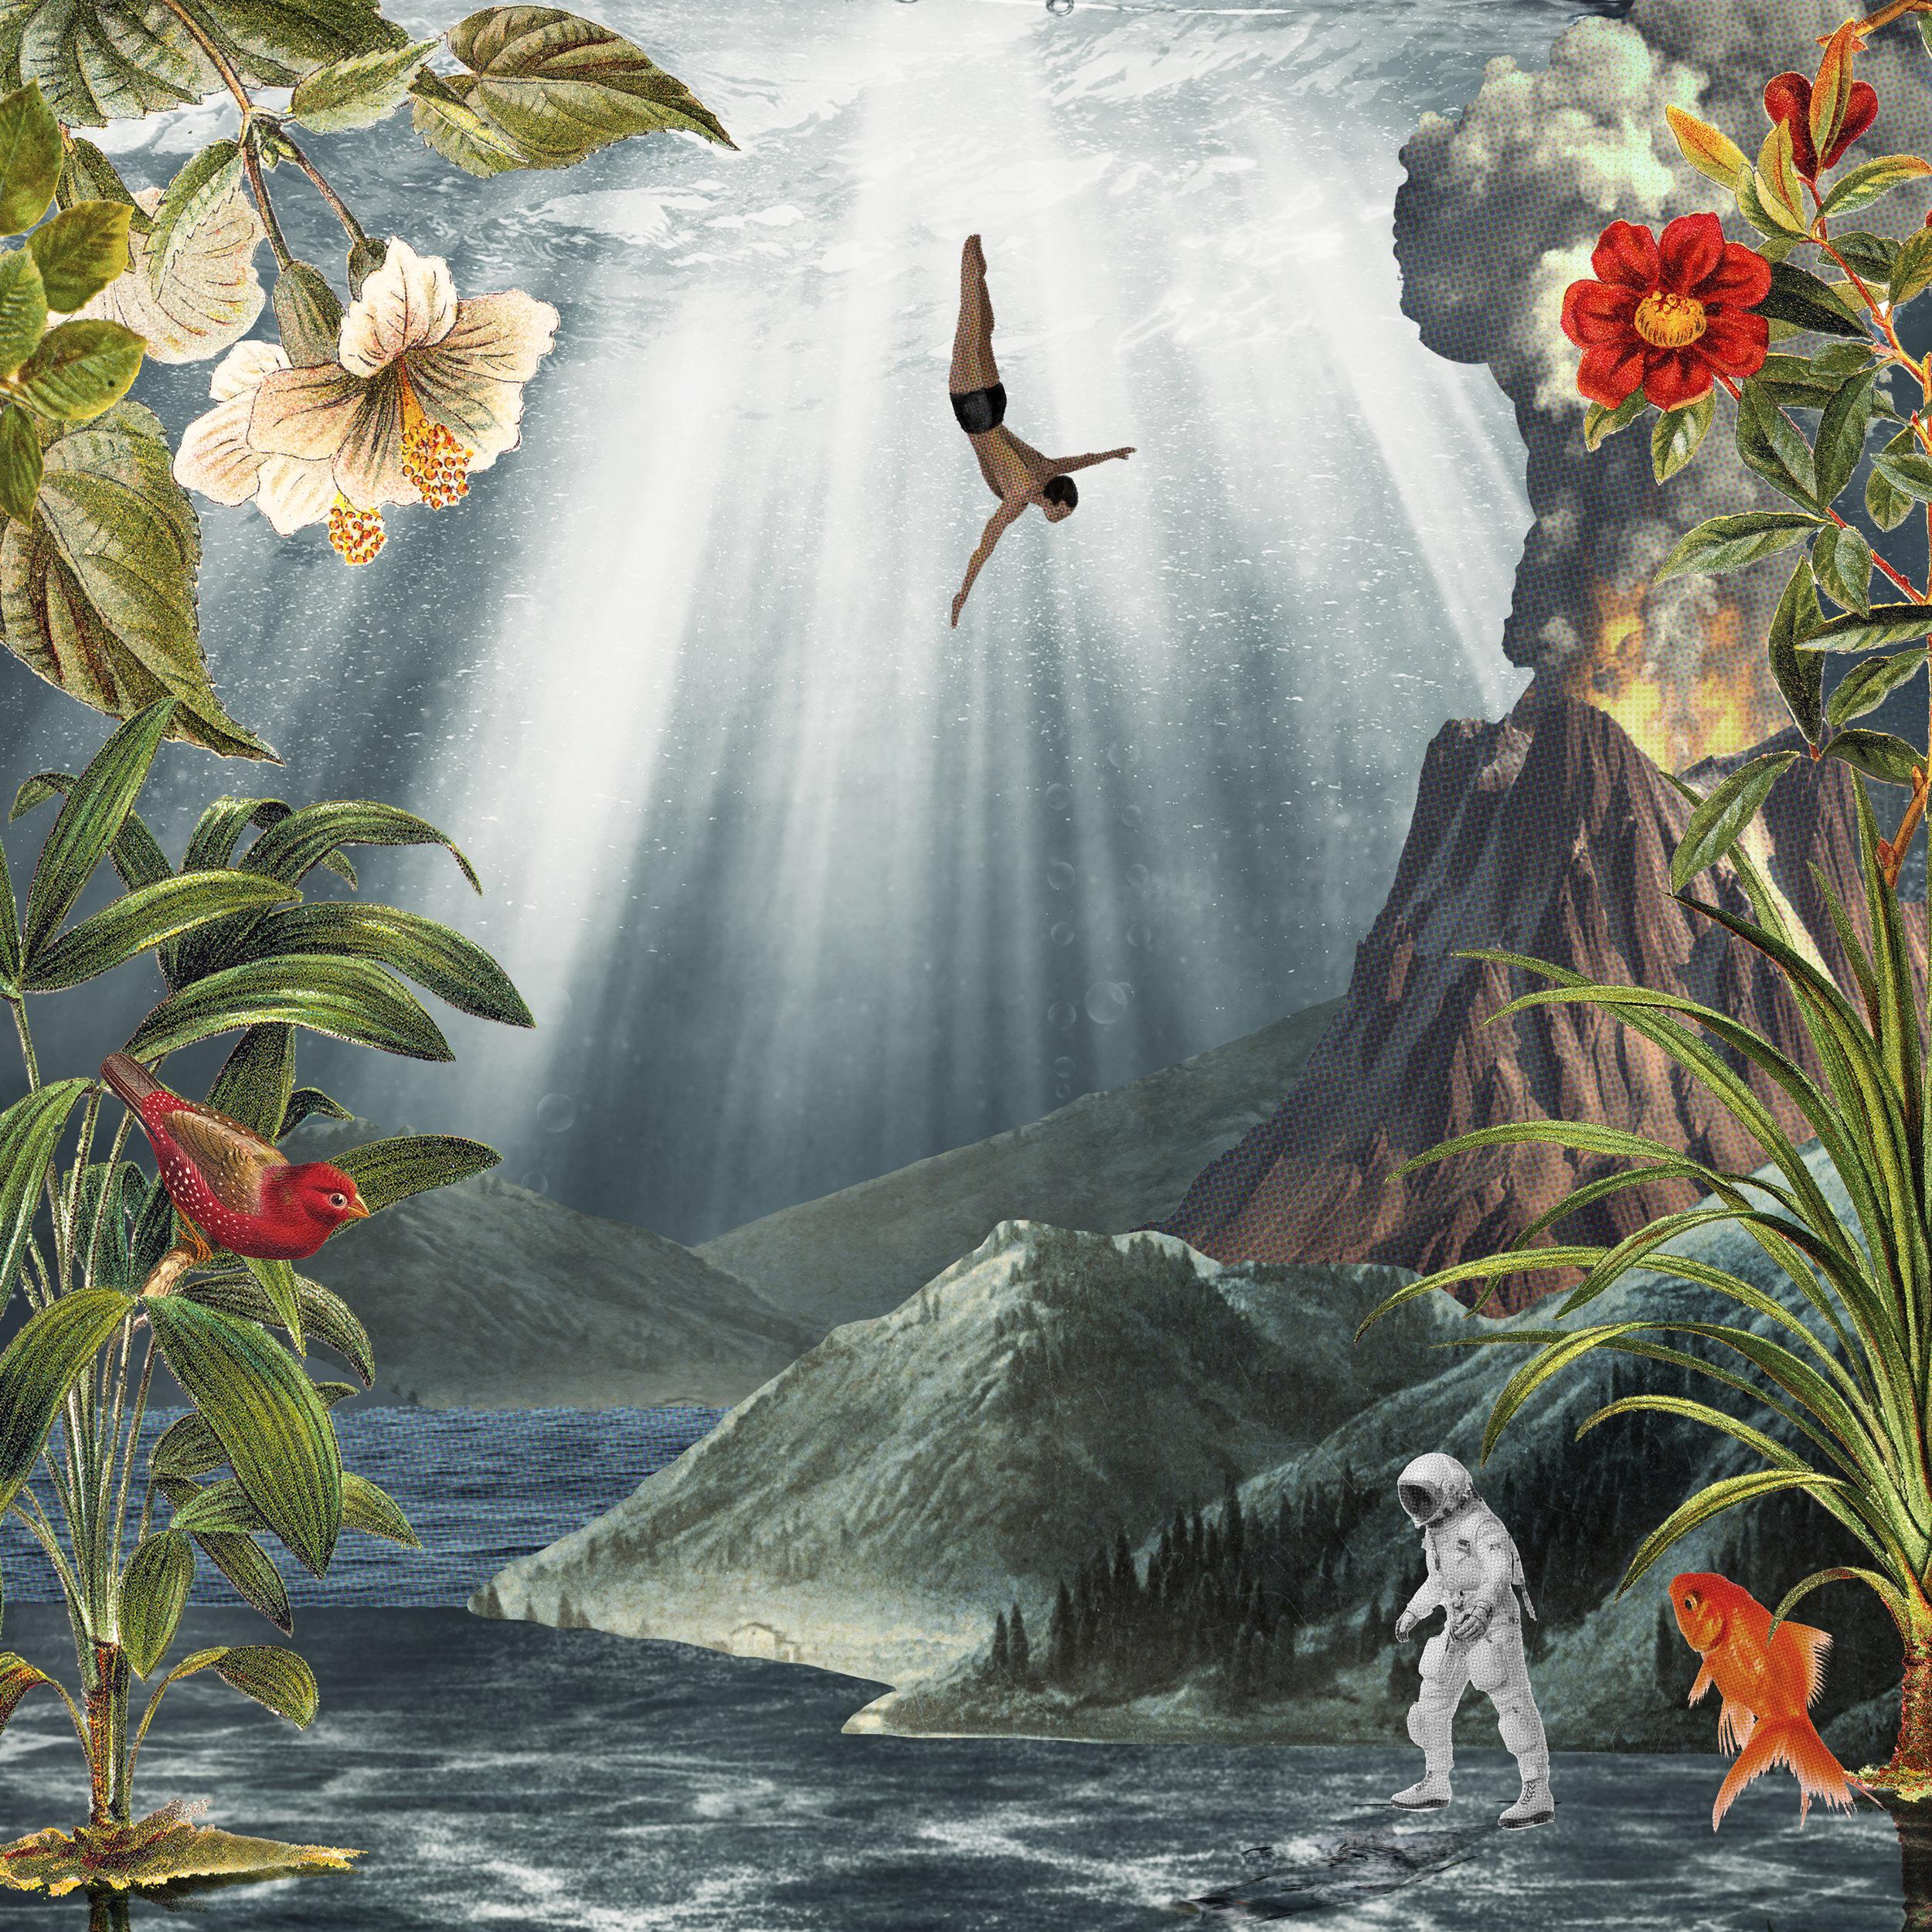 Junior Garr - Waters - 300dpi, 4000 x 4000 JPG RGB.jpg